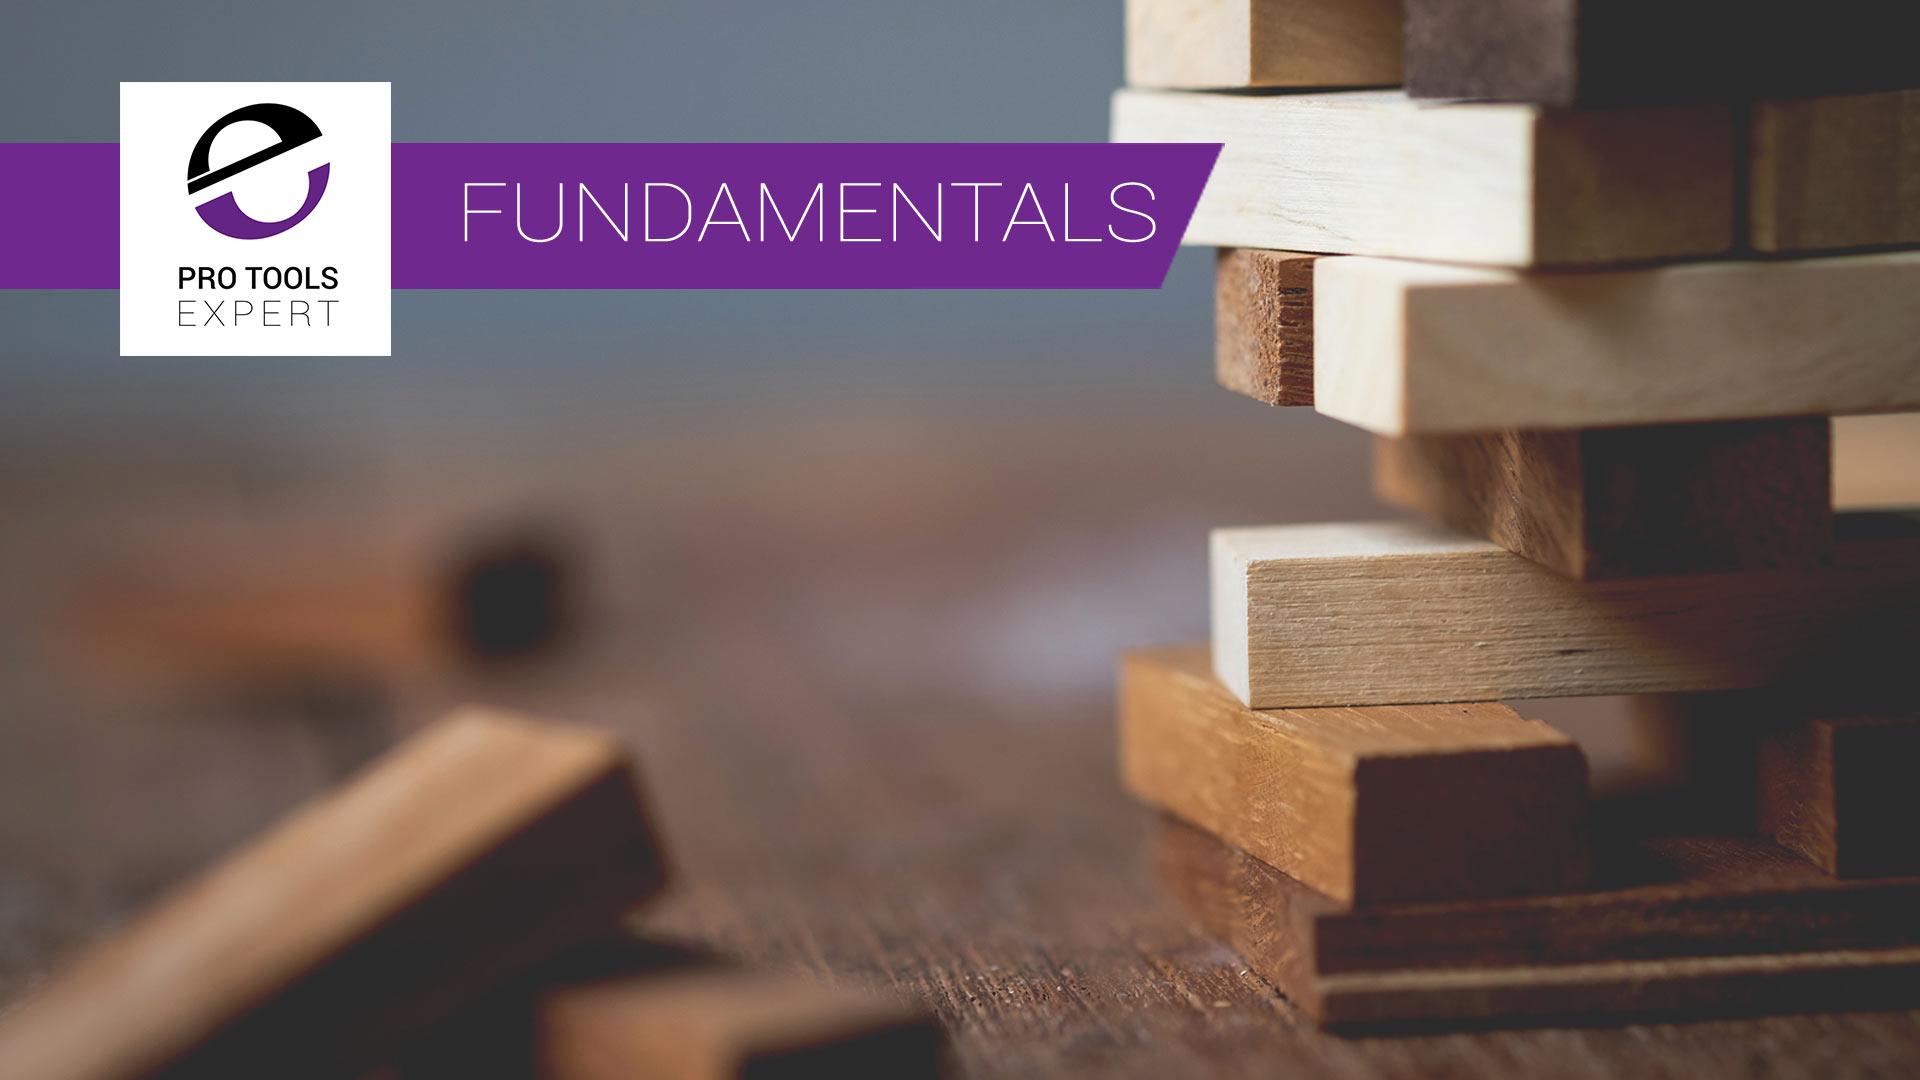 Pro Tools Fundamentals - Understanding Busses